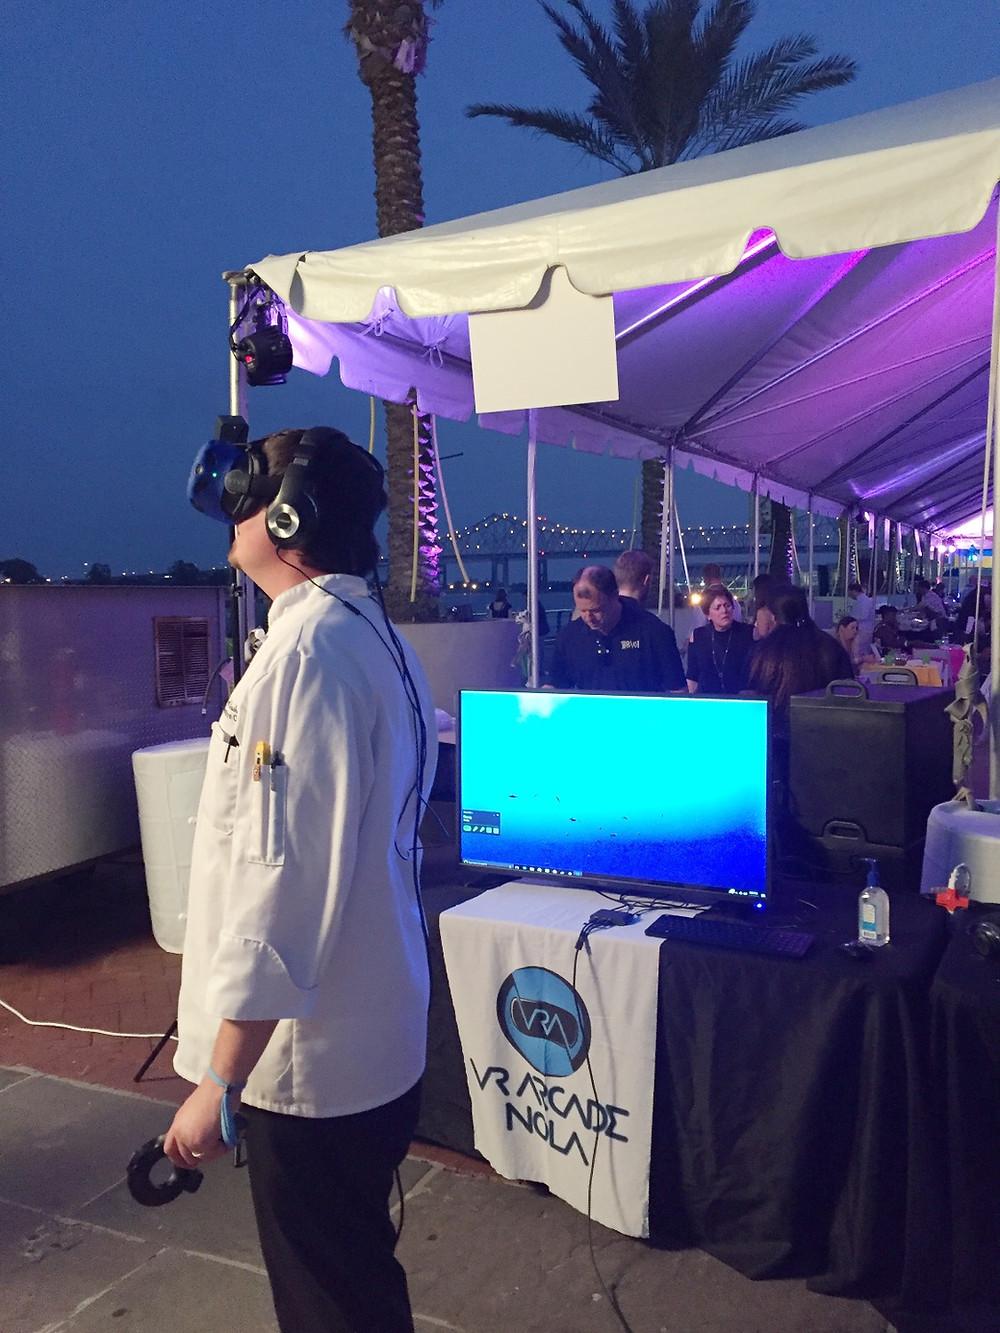 An outdoor virtual reality life